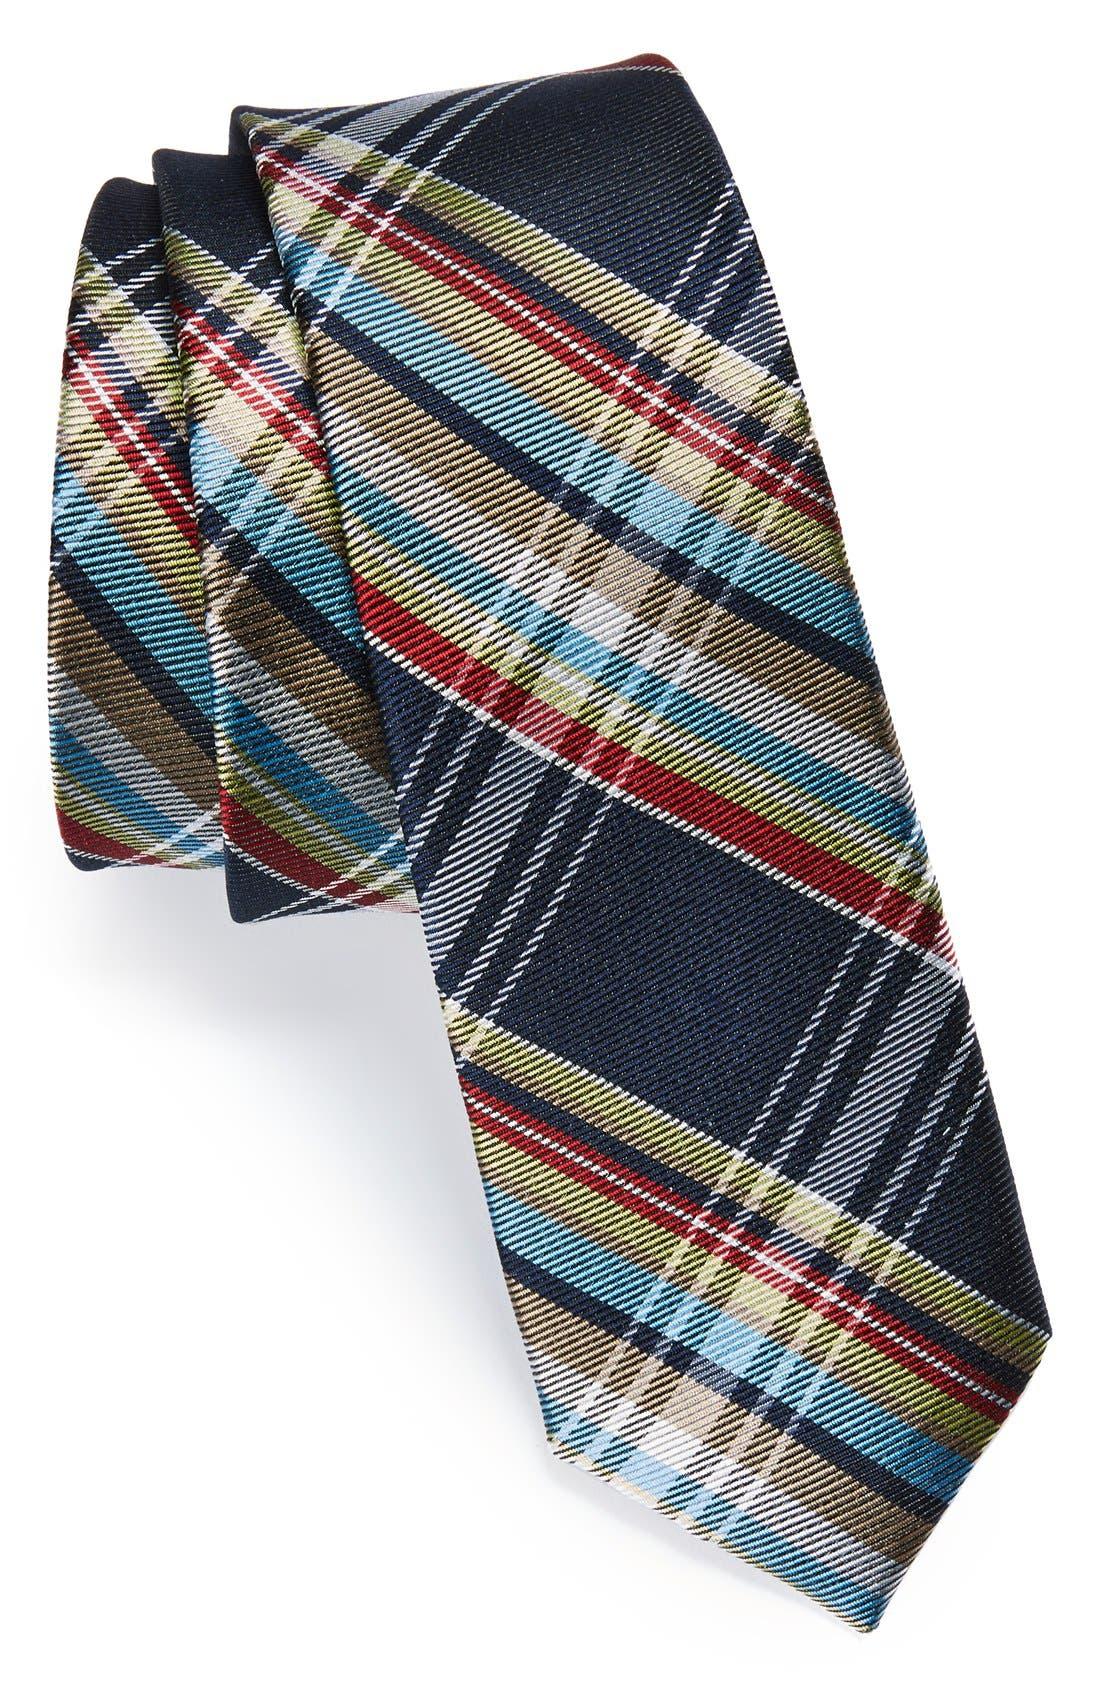 Alternate Image 1 Selected - Original Penguin Woven Silk Tie